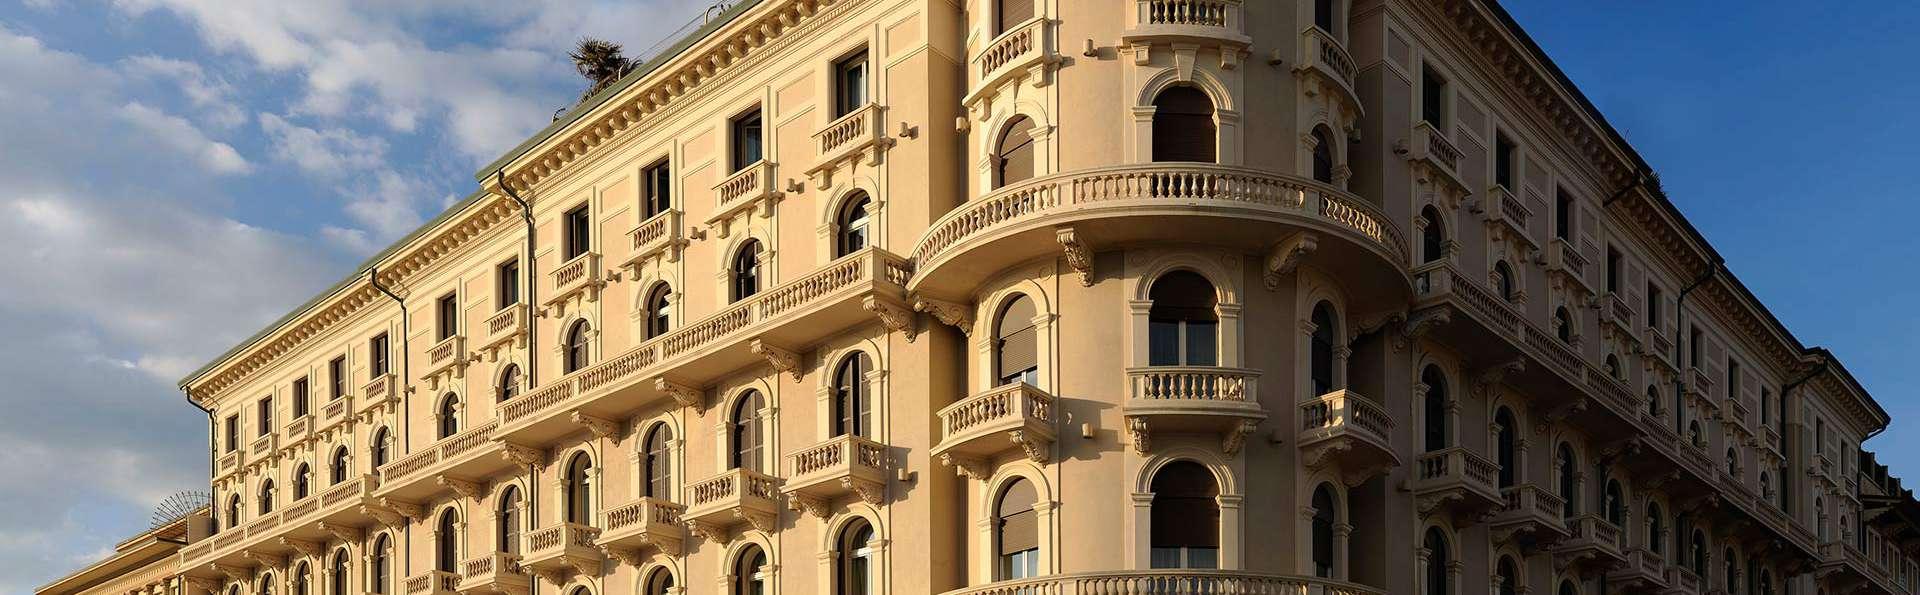 Grand Hotel Principe di Piemonte - EDIT_front1.jpg